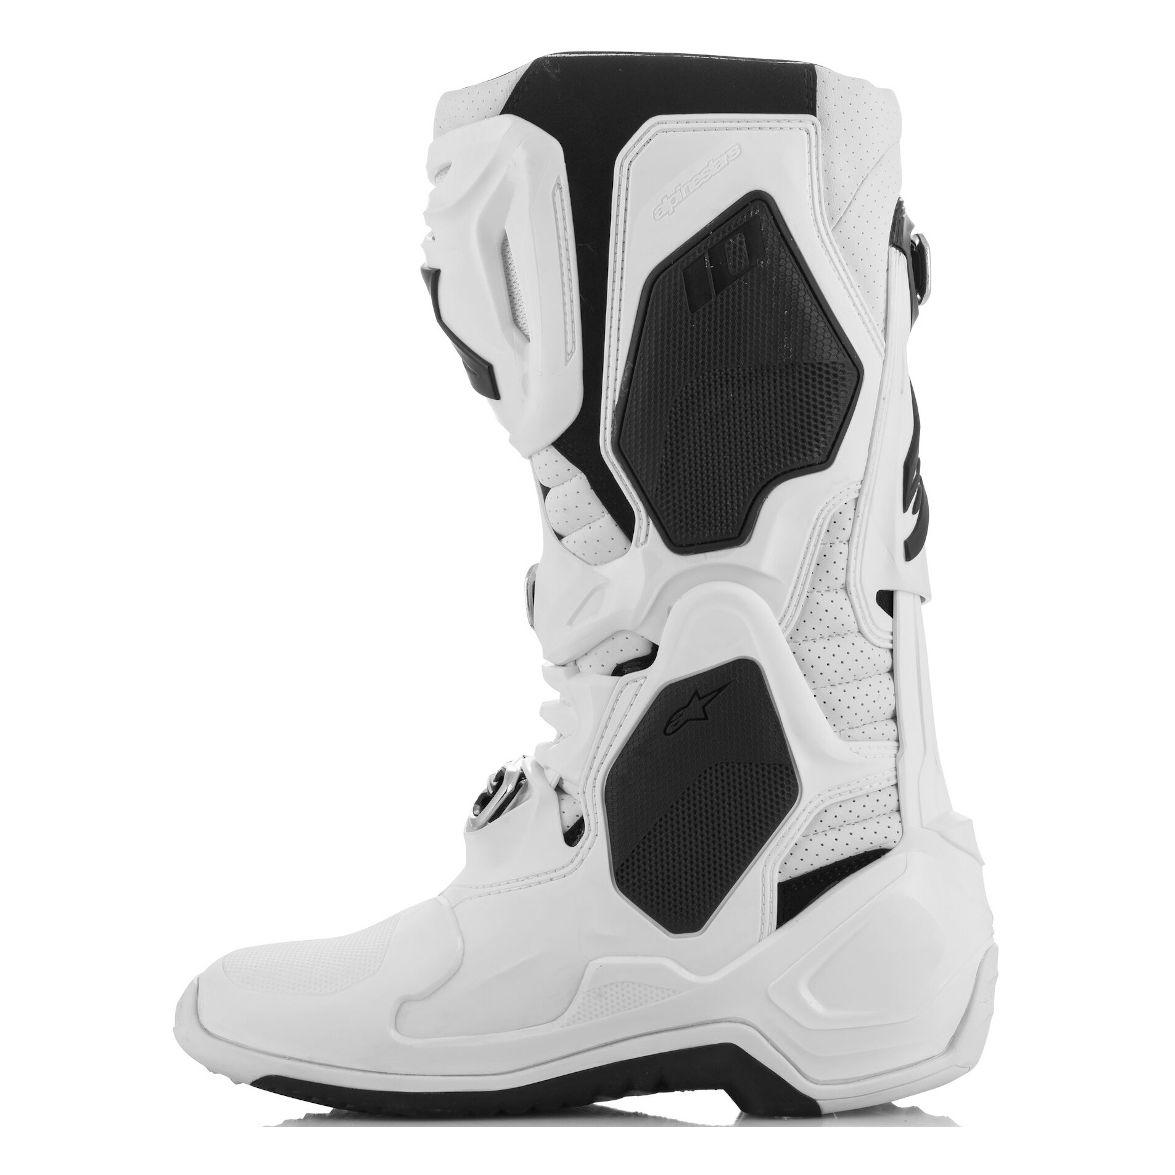 Stivali da cross Alpinestars TECH 10 WHITE 2021 Stivali